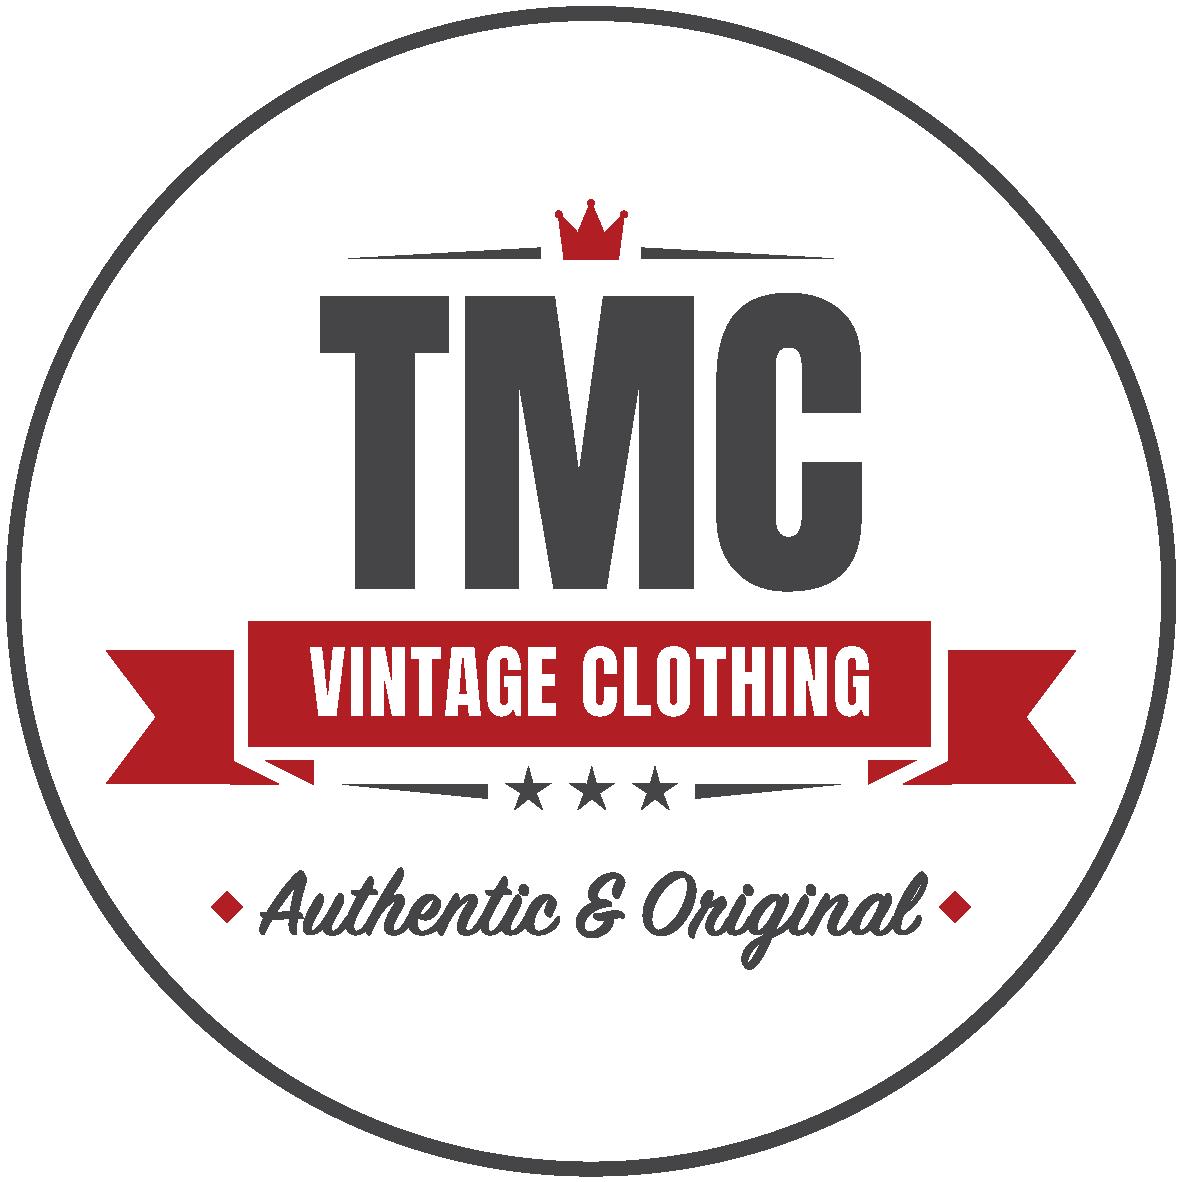 tmc_vintage_clothing_logo